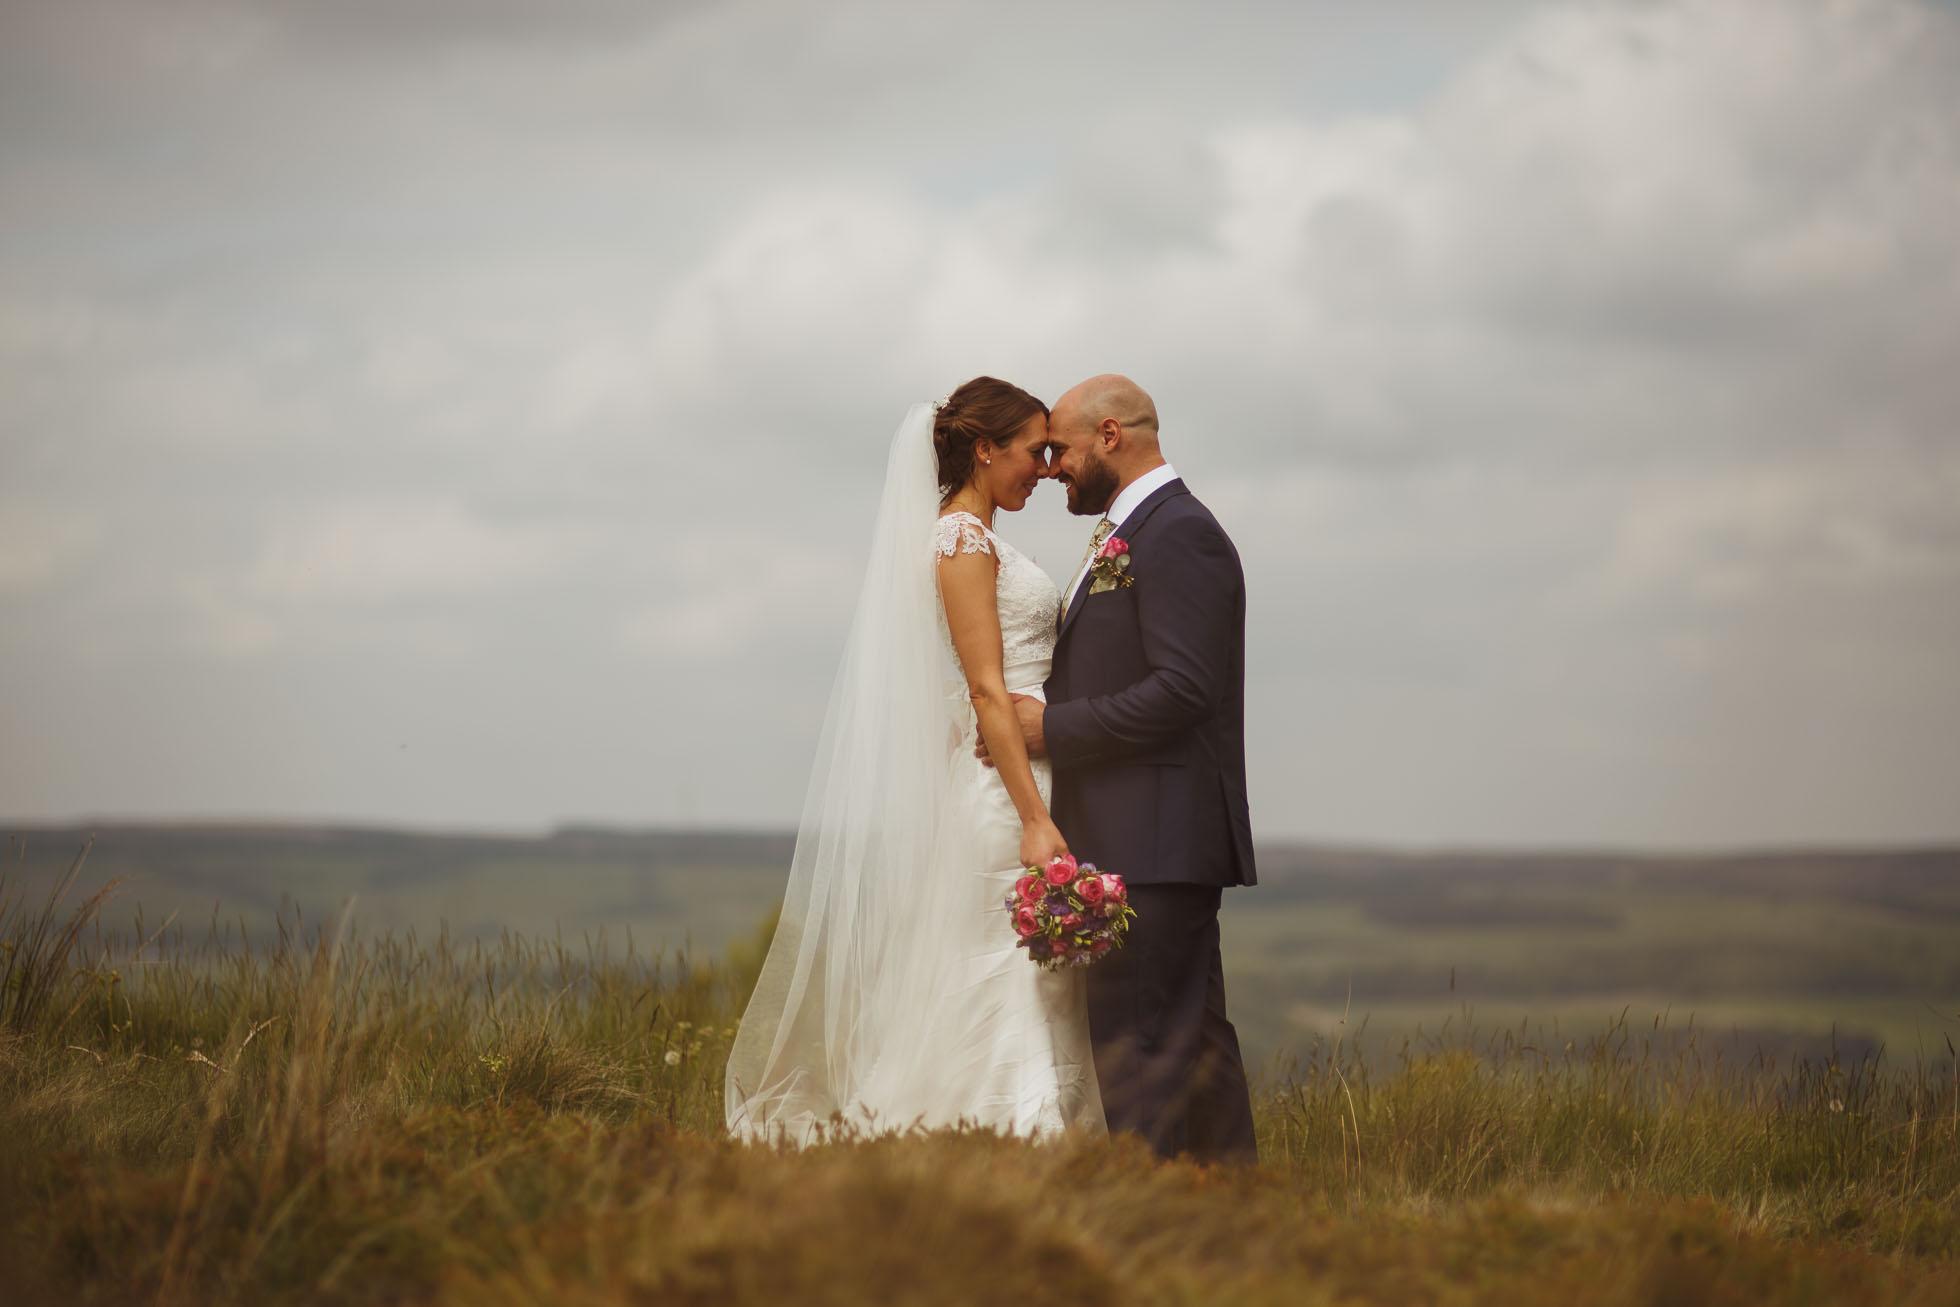 denton-hall-wedding-photographer-38.jpg